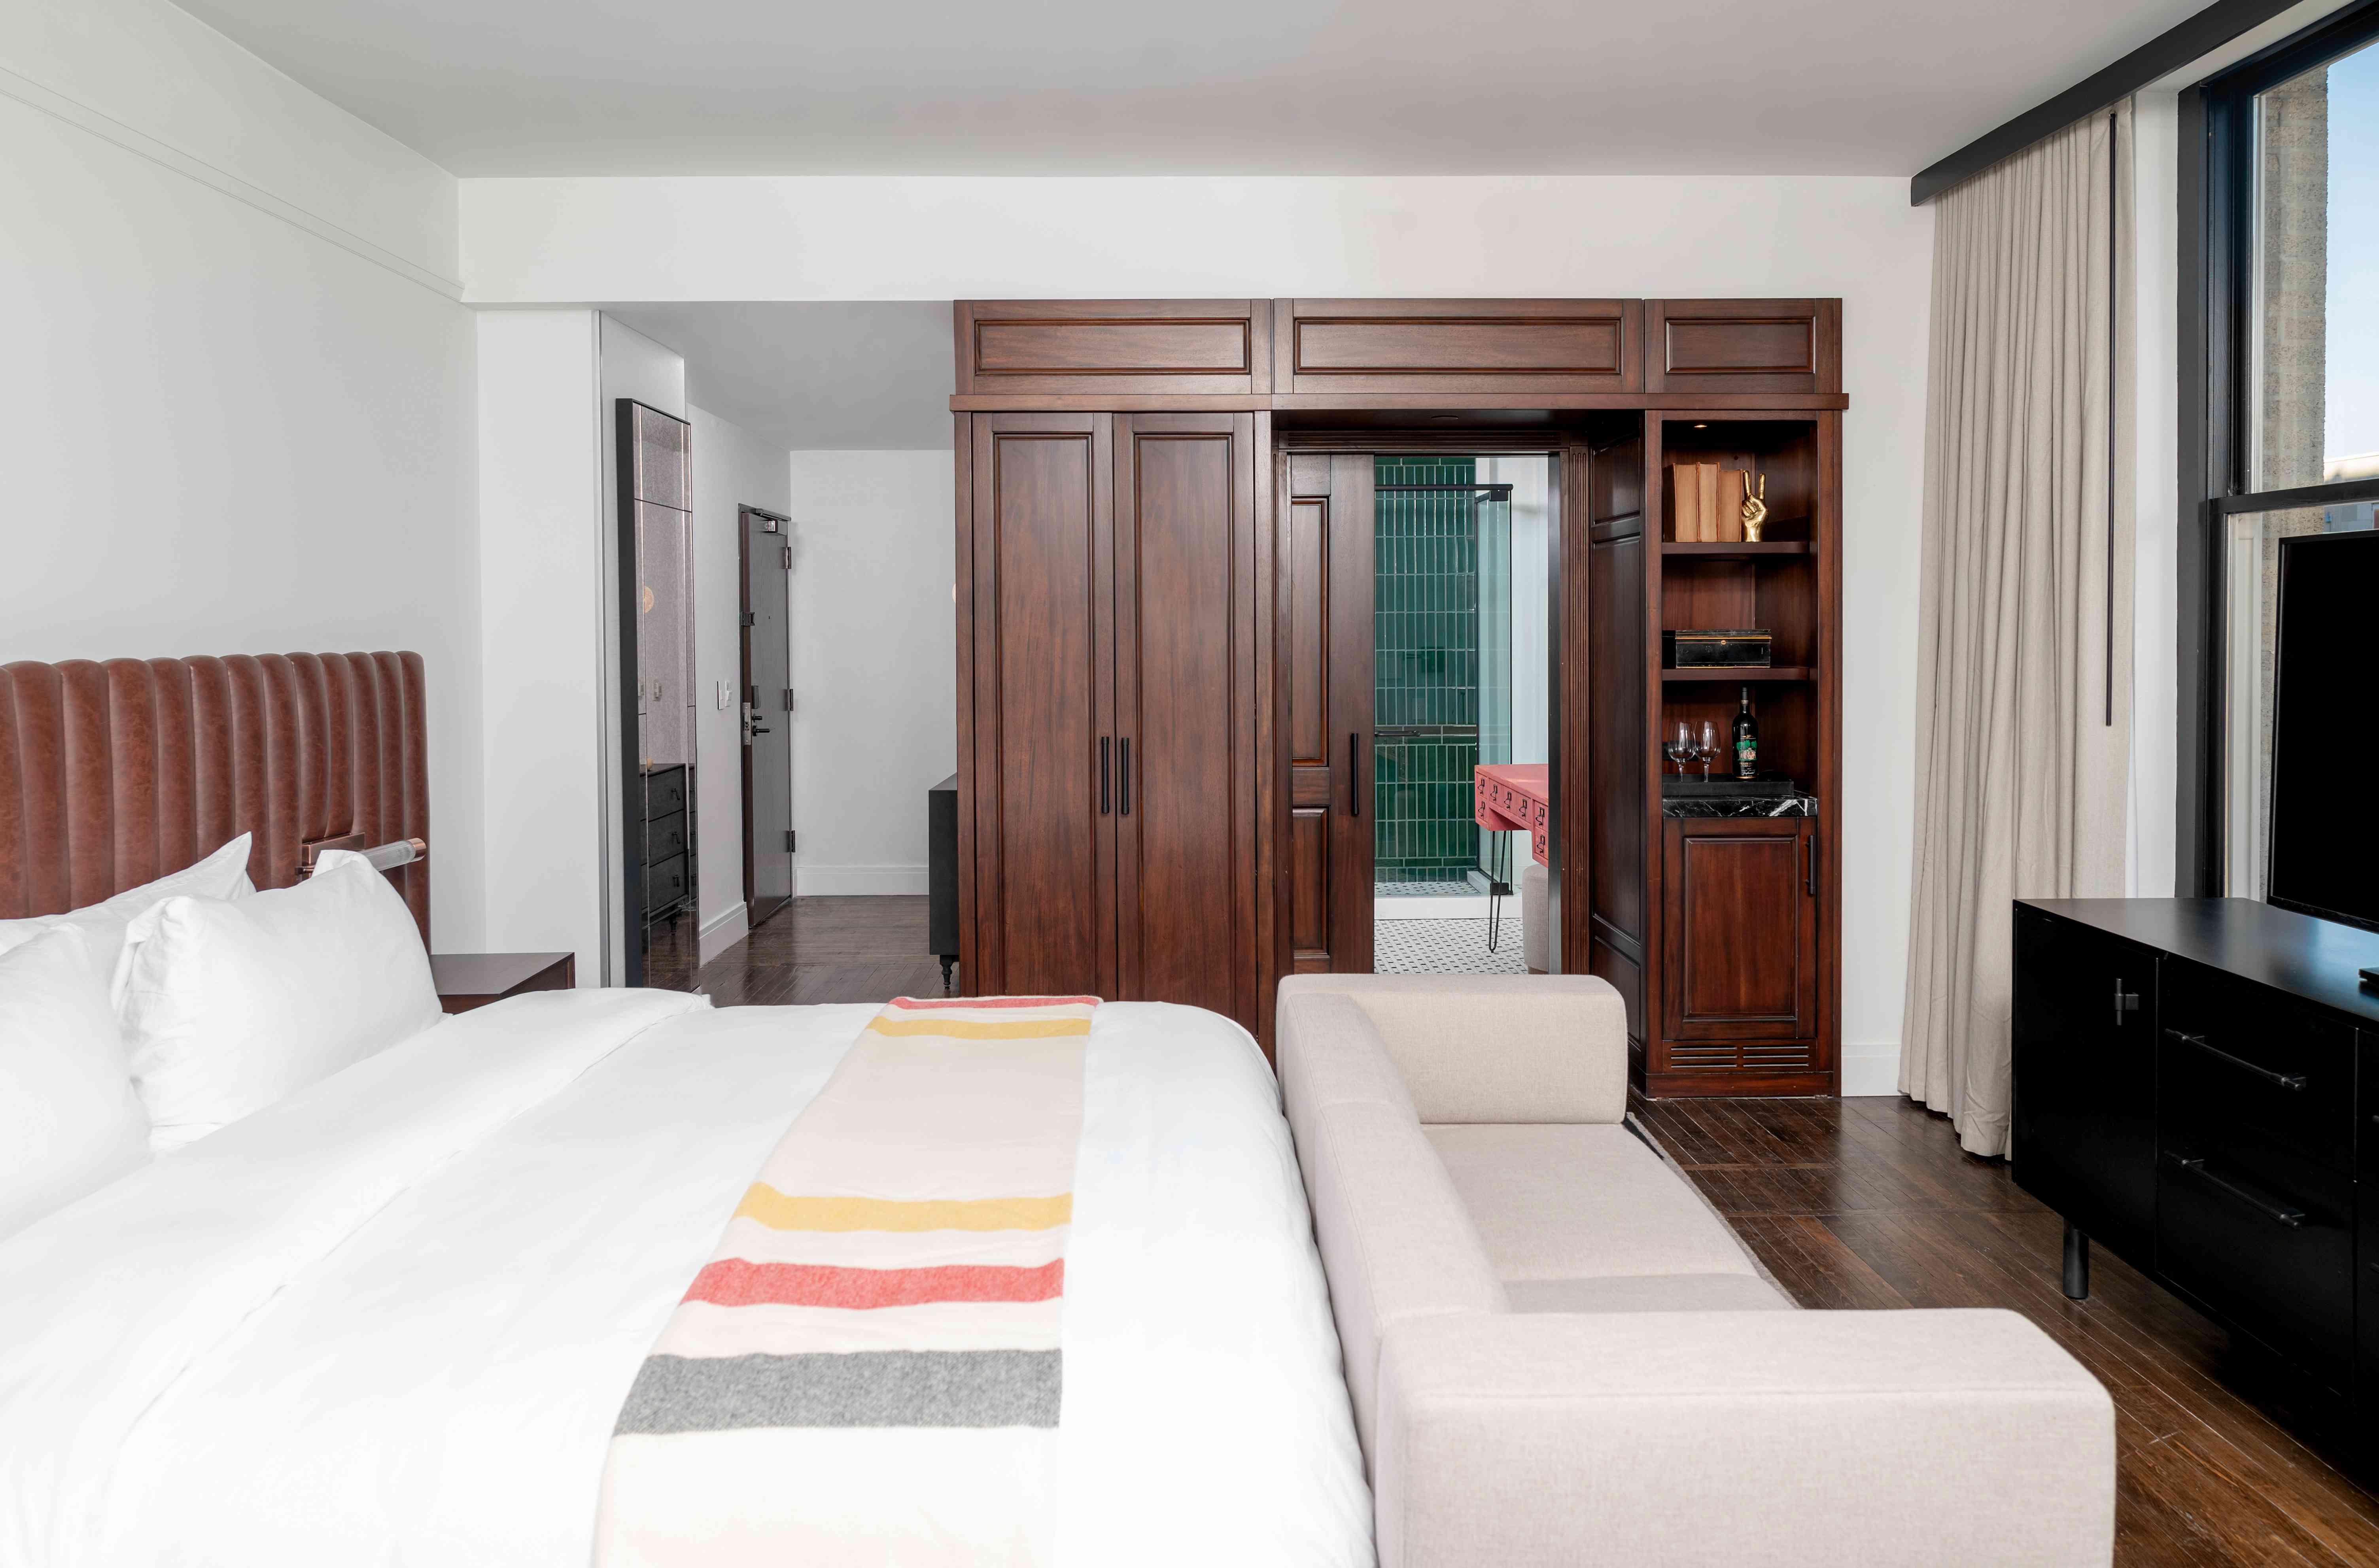 Surety Hotel guest room